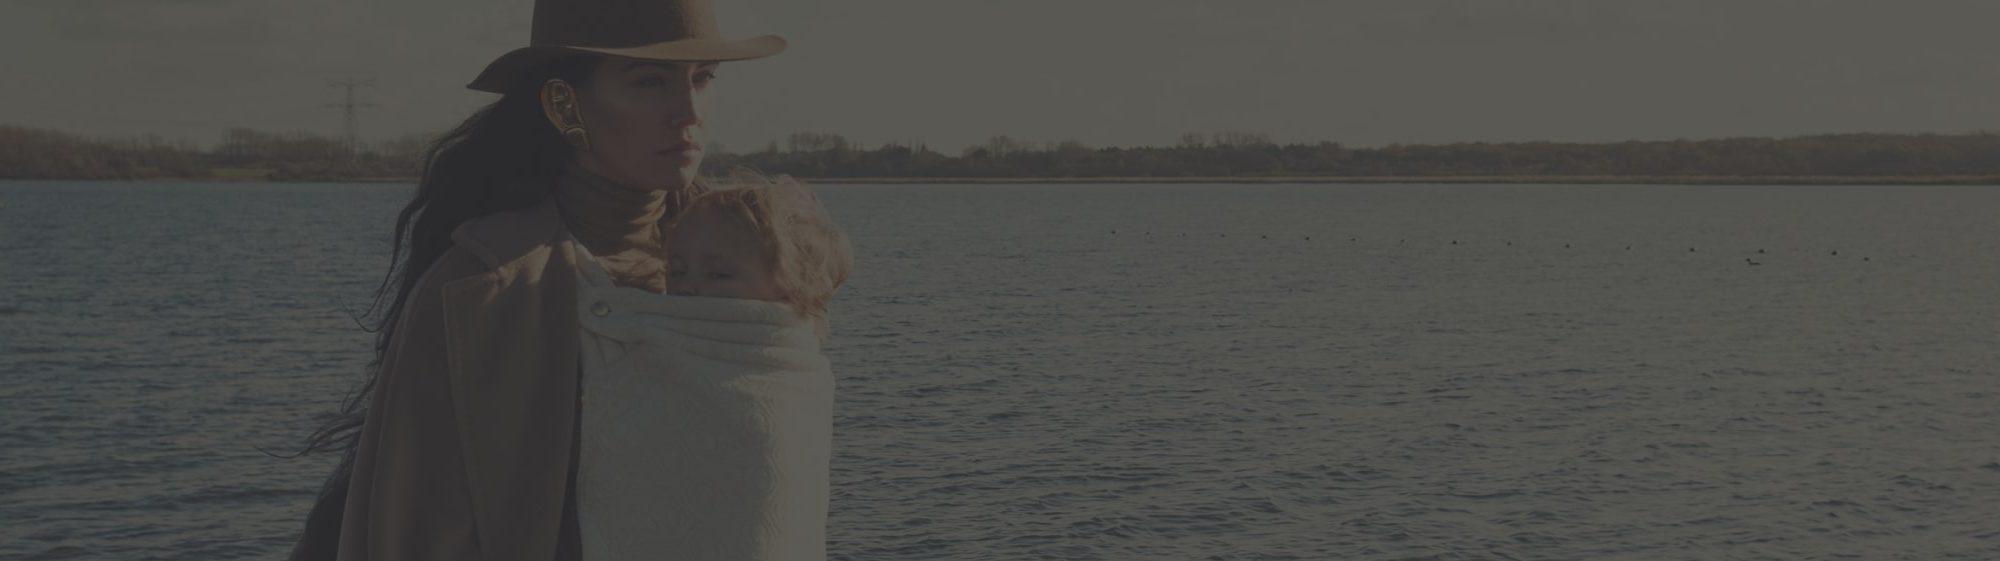 Artipoppe-main-banner-user-case